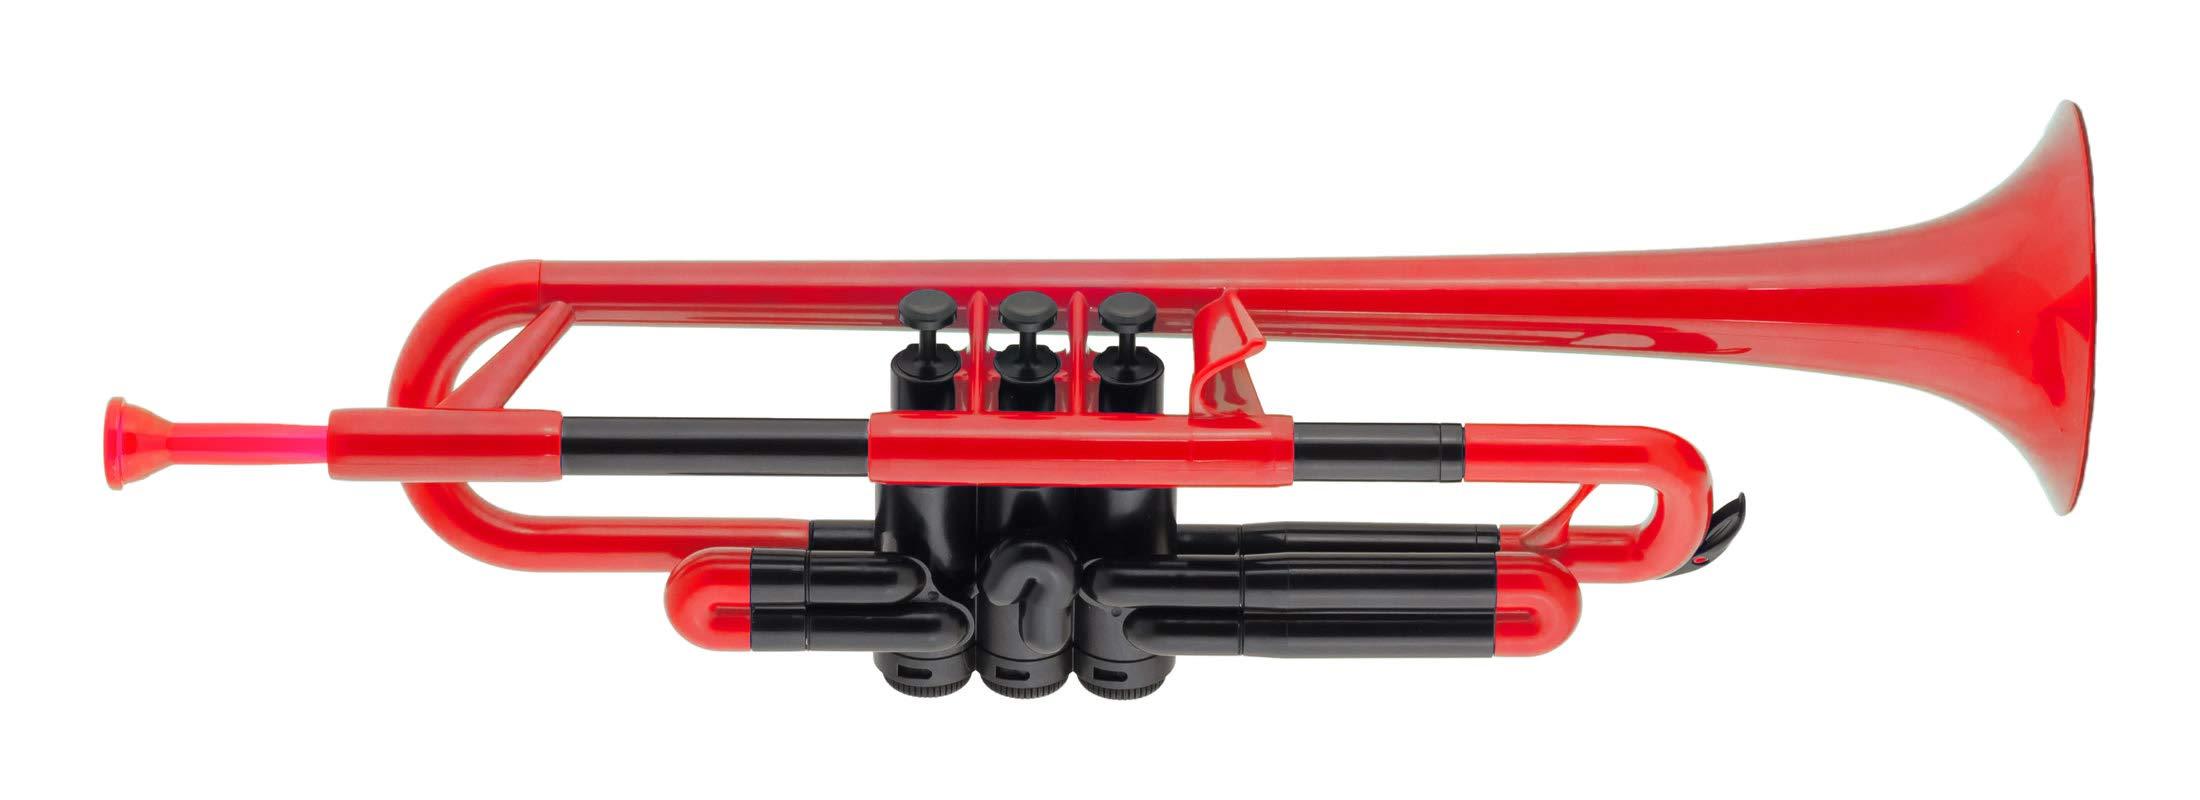 pBone PTRUMPET1R Plastic Trumpet, Red by pBone